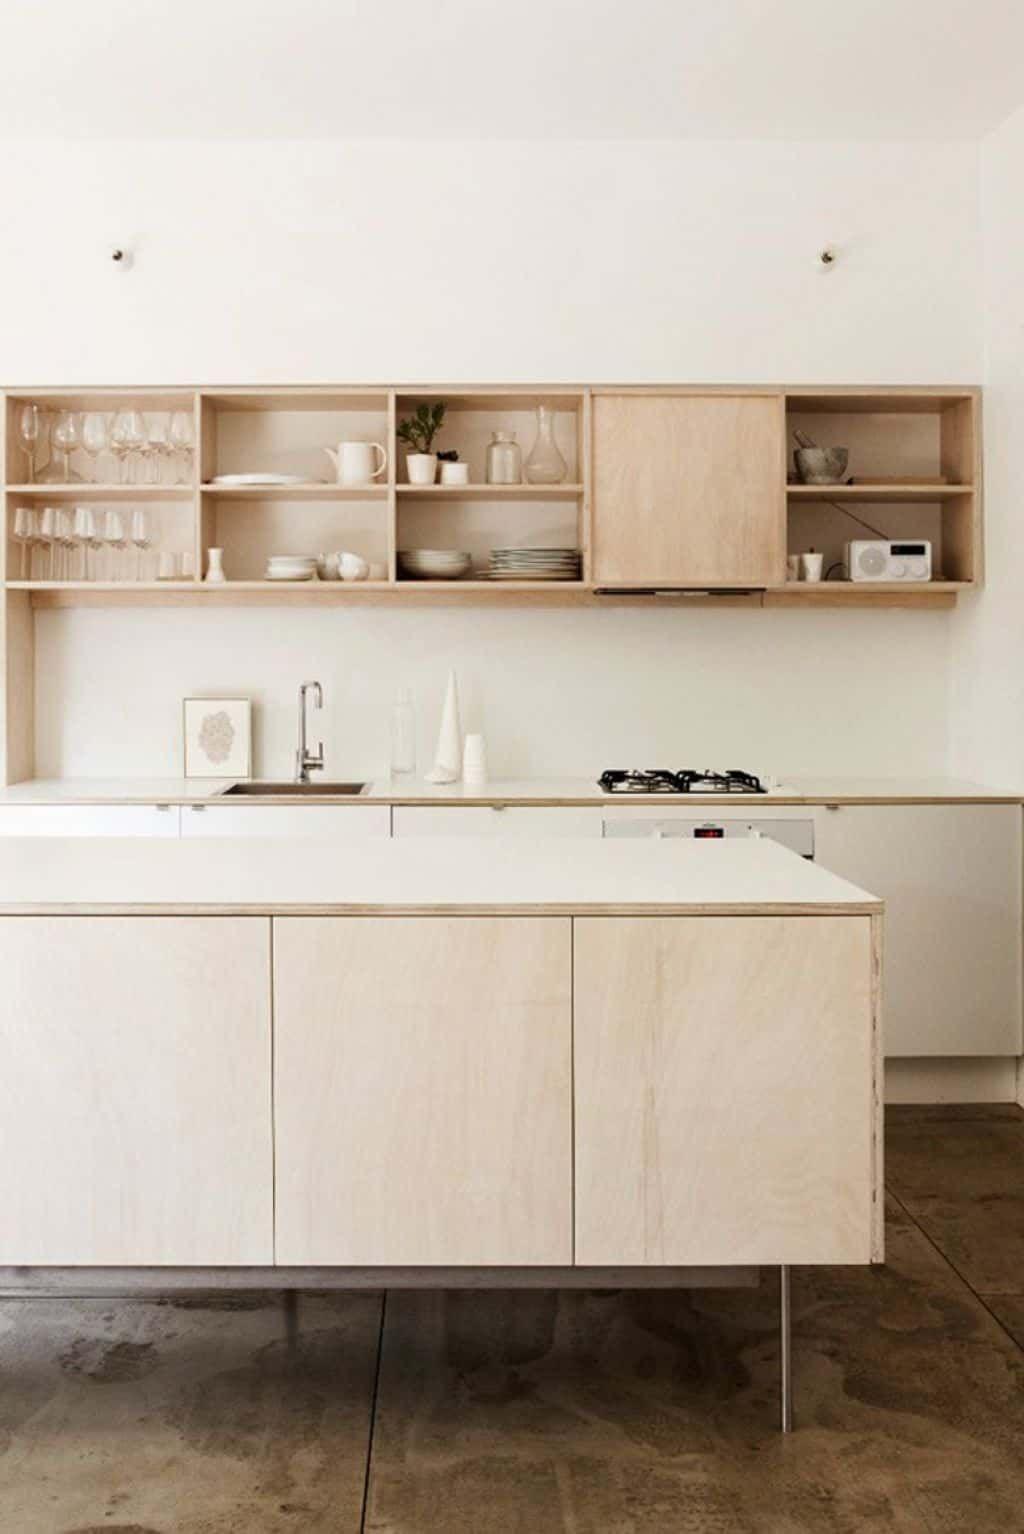 markante sperrholz m bel f r ihr haus sperrholz verwendet werden um gerade ber irgend. Black Bedroom Furniture Sets. Home Design Ideas